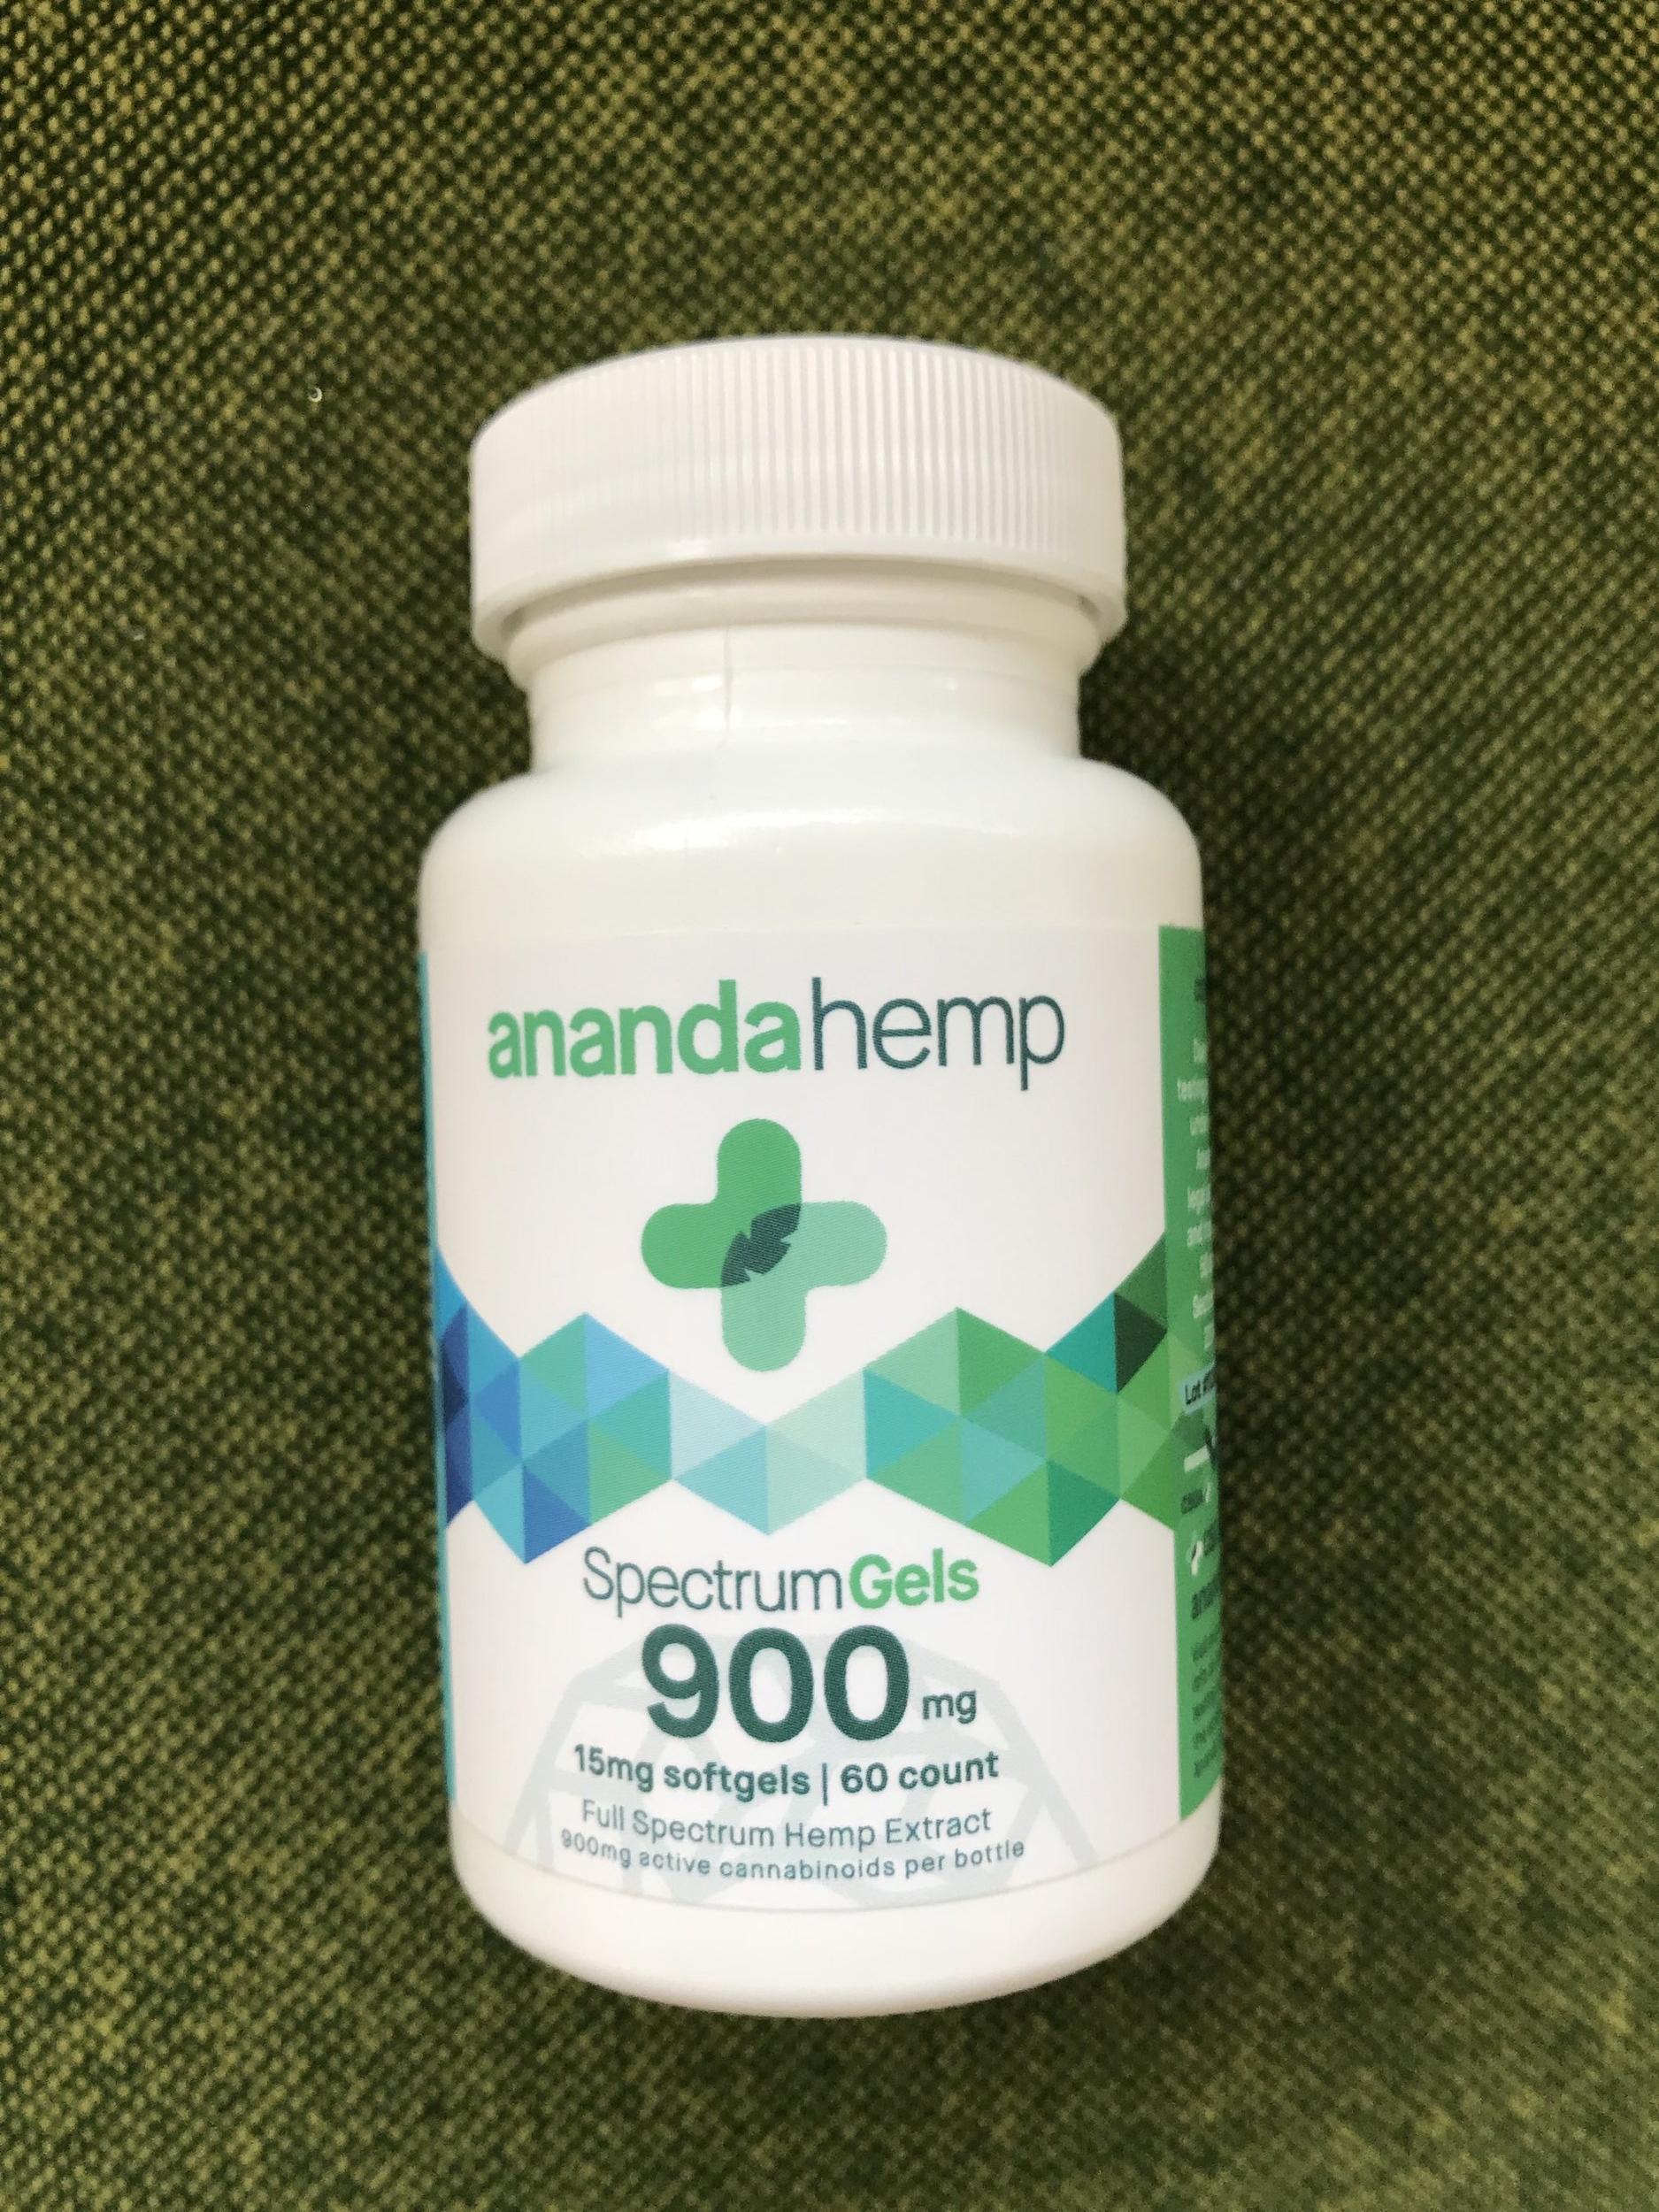 Ananda Spectrum Gels 15mg - $120.00 (60 count)